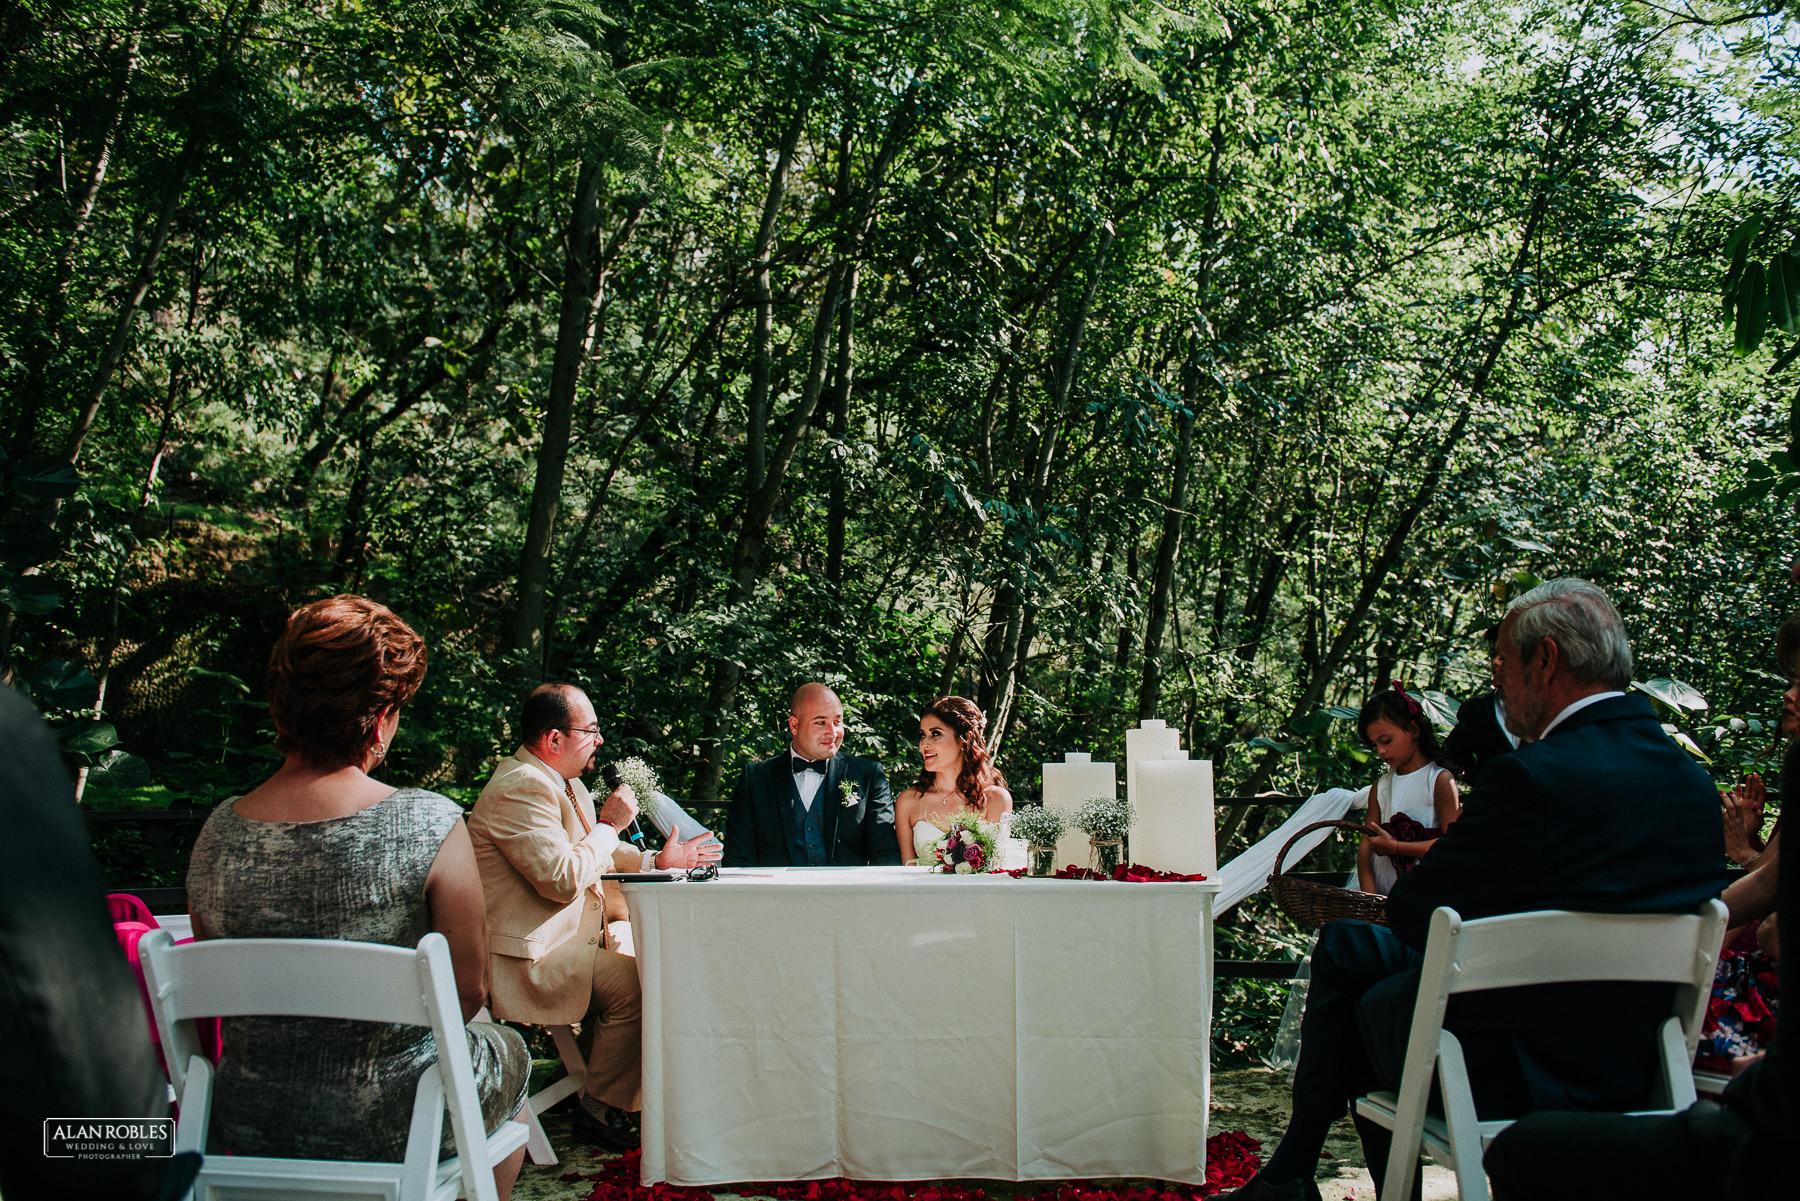 Fotografo de bodas guadalajara Alan Robles - Pinare terraza bistro 39